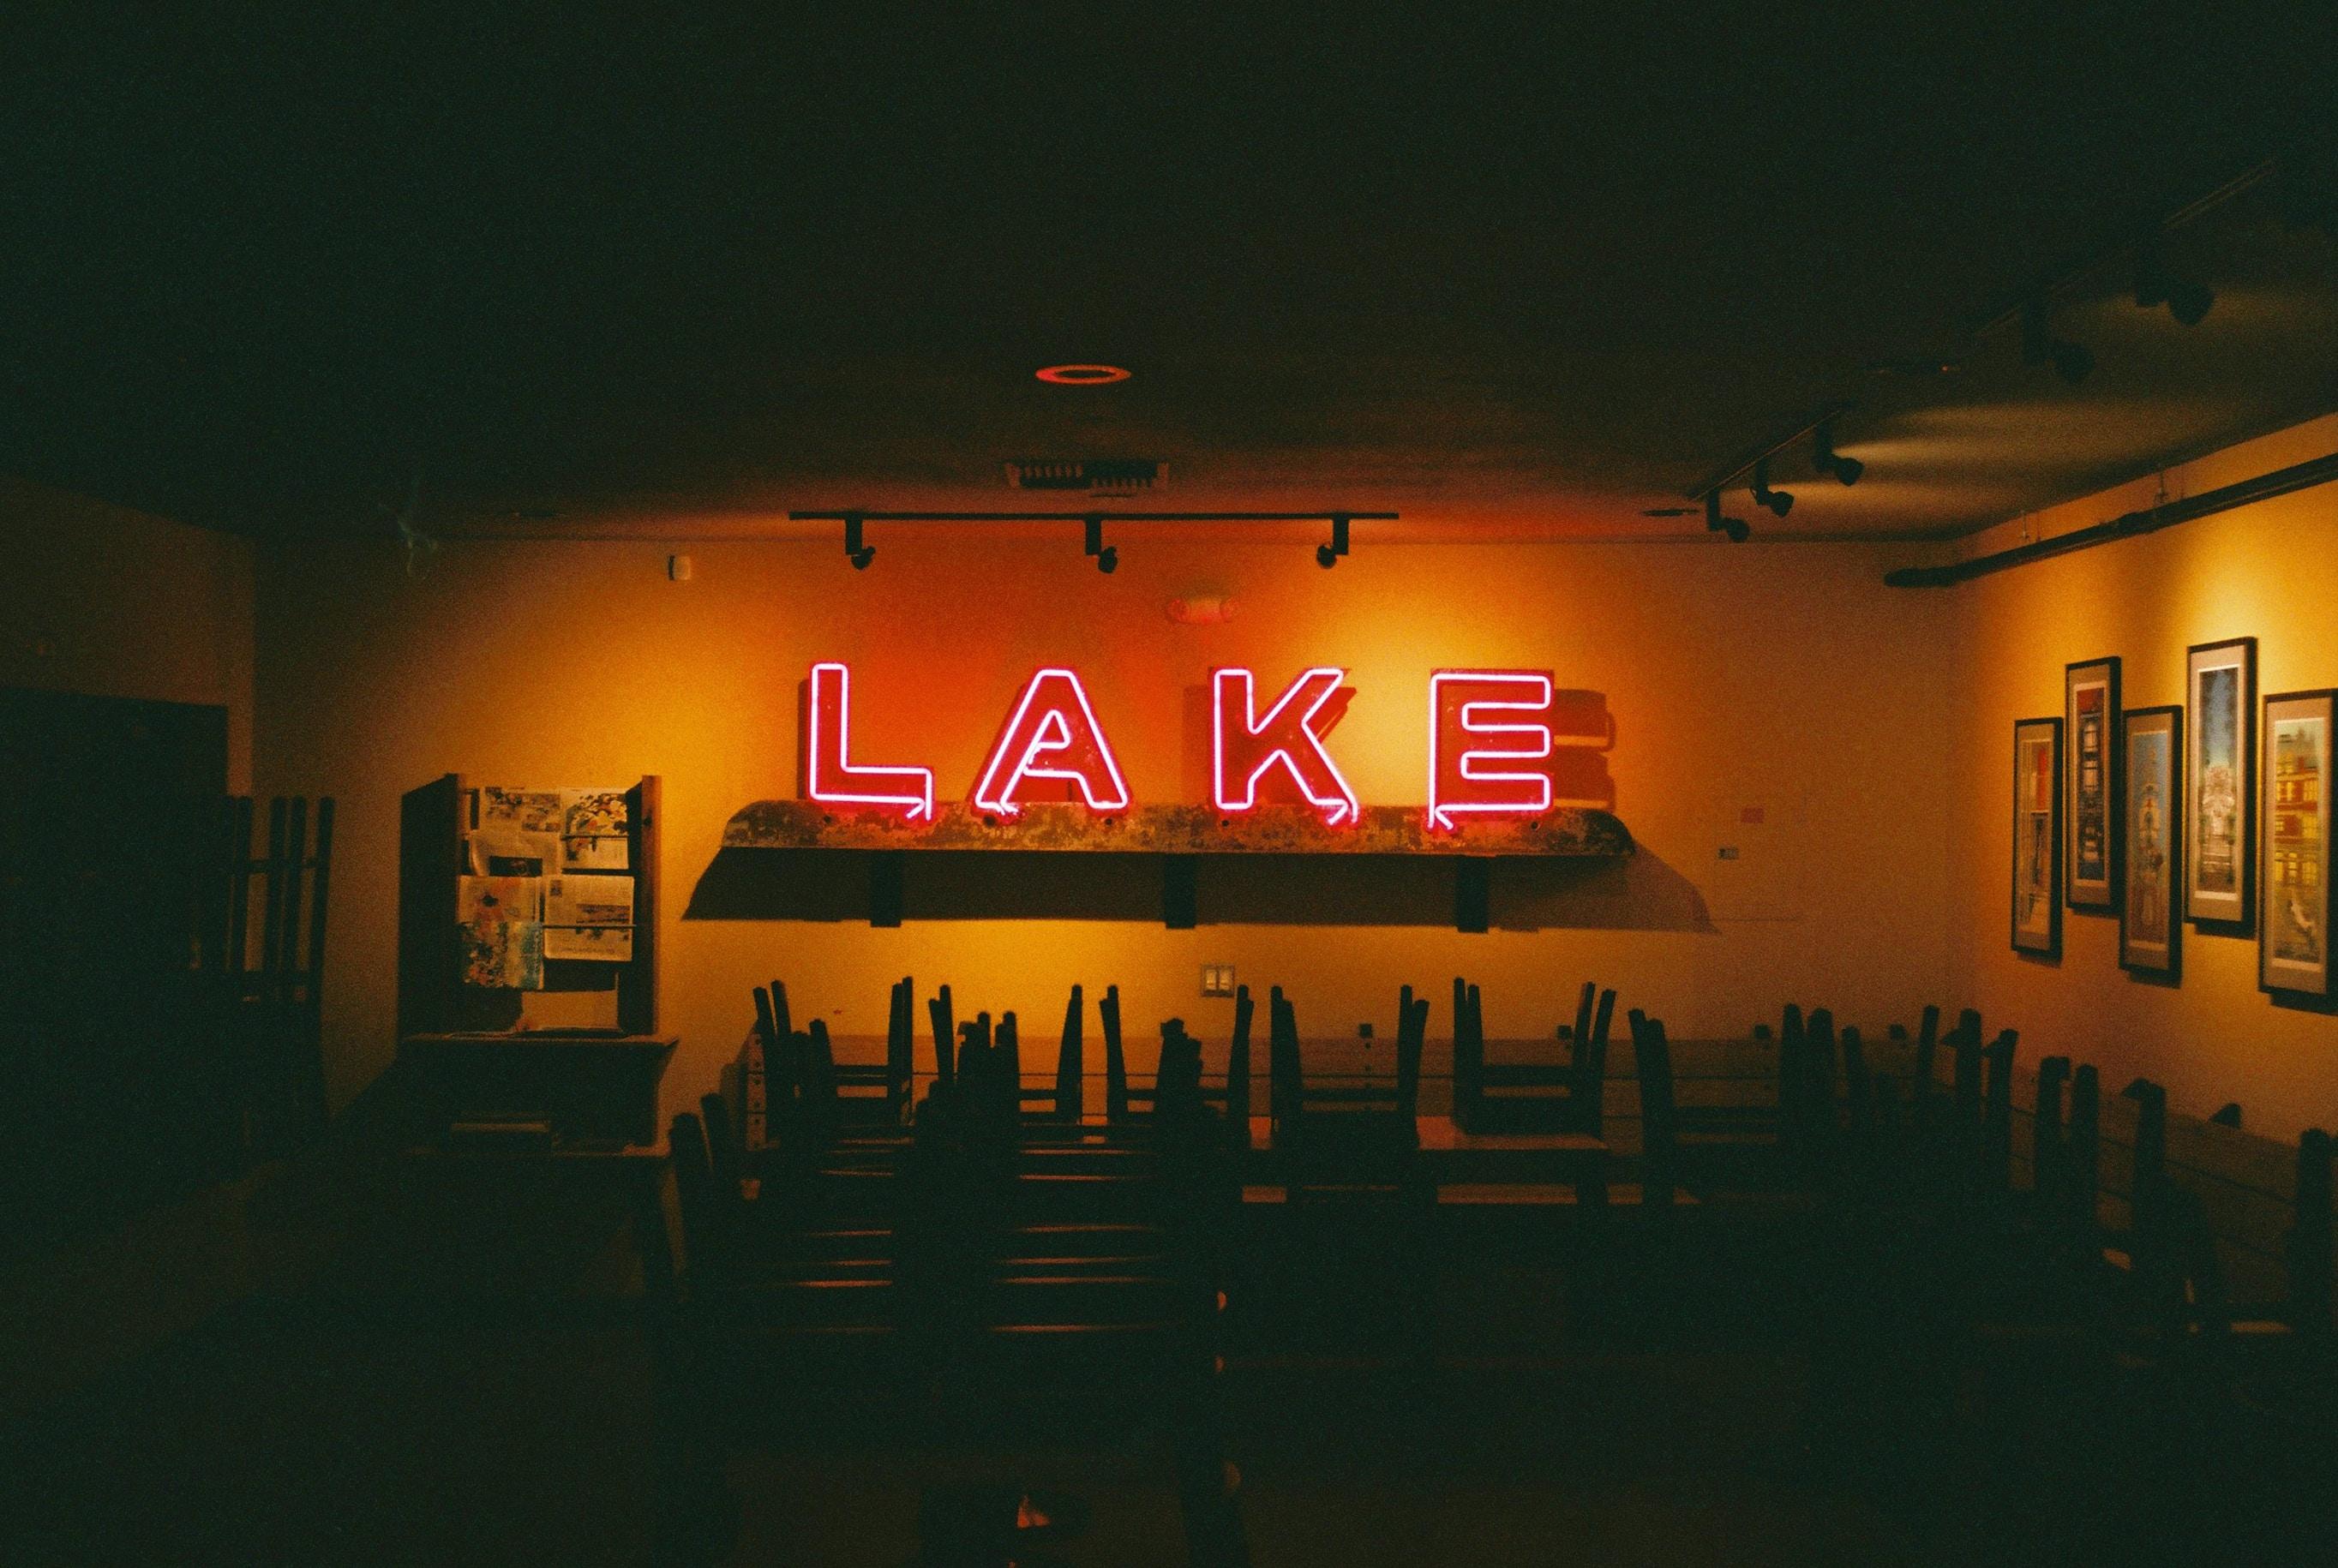 red Lake LED signage inside room